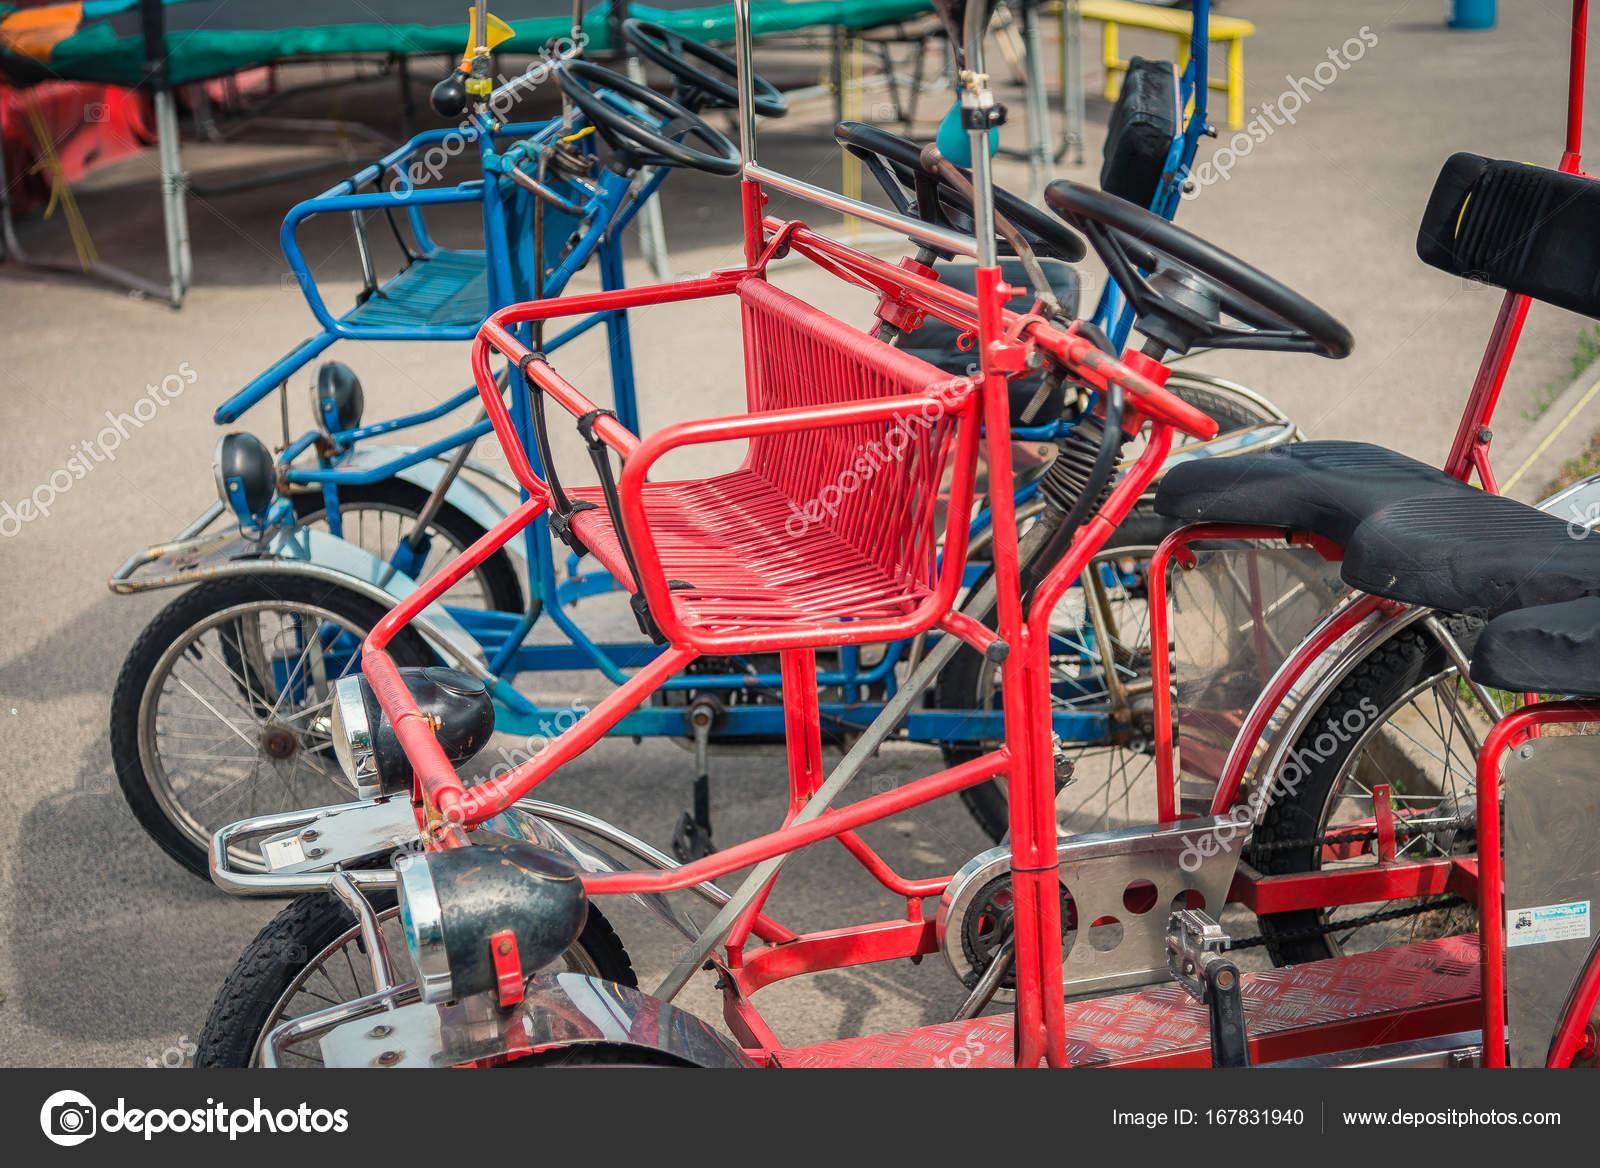 fahrrad mit vier r dern stockfoto liukov 167831940. Black Bedroom Furniture Sets. Home Design Ideas